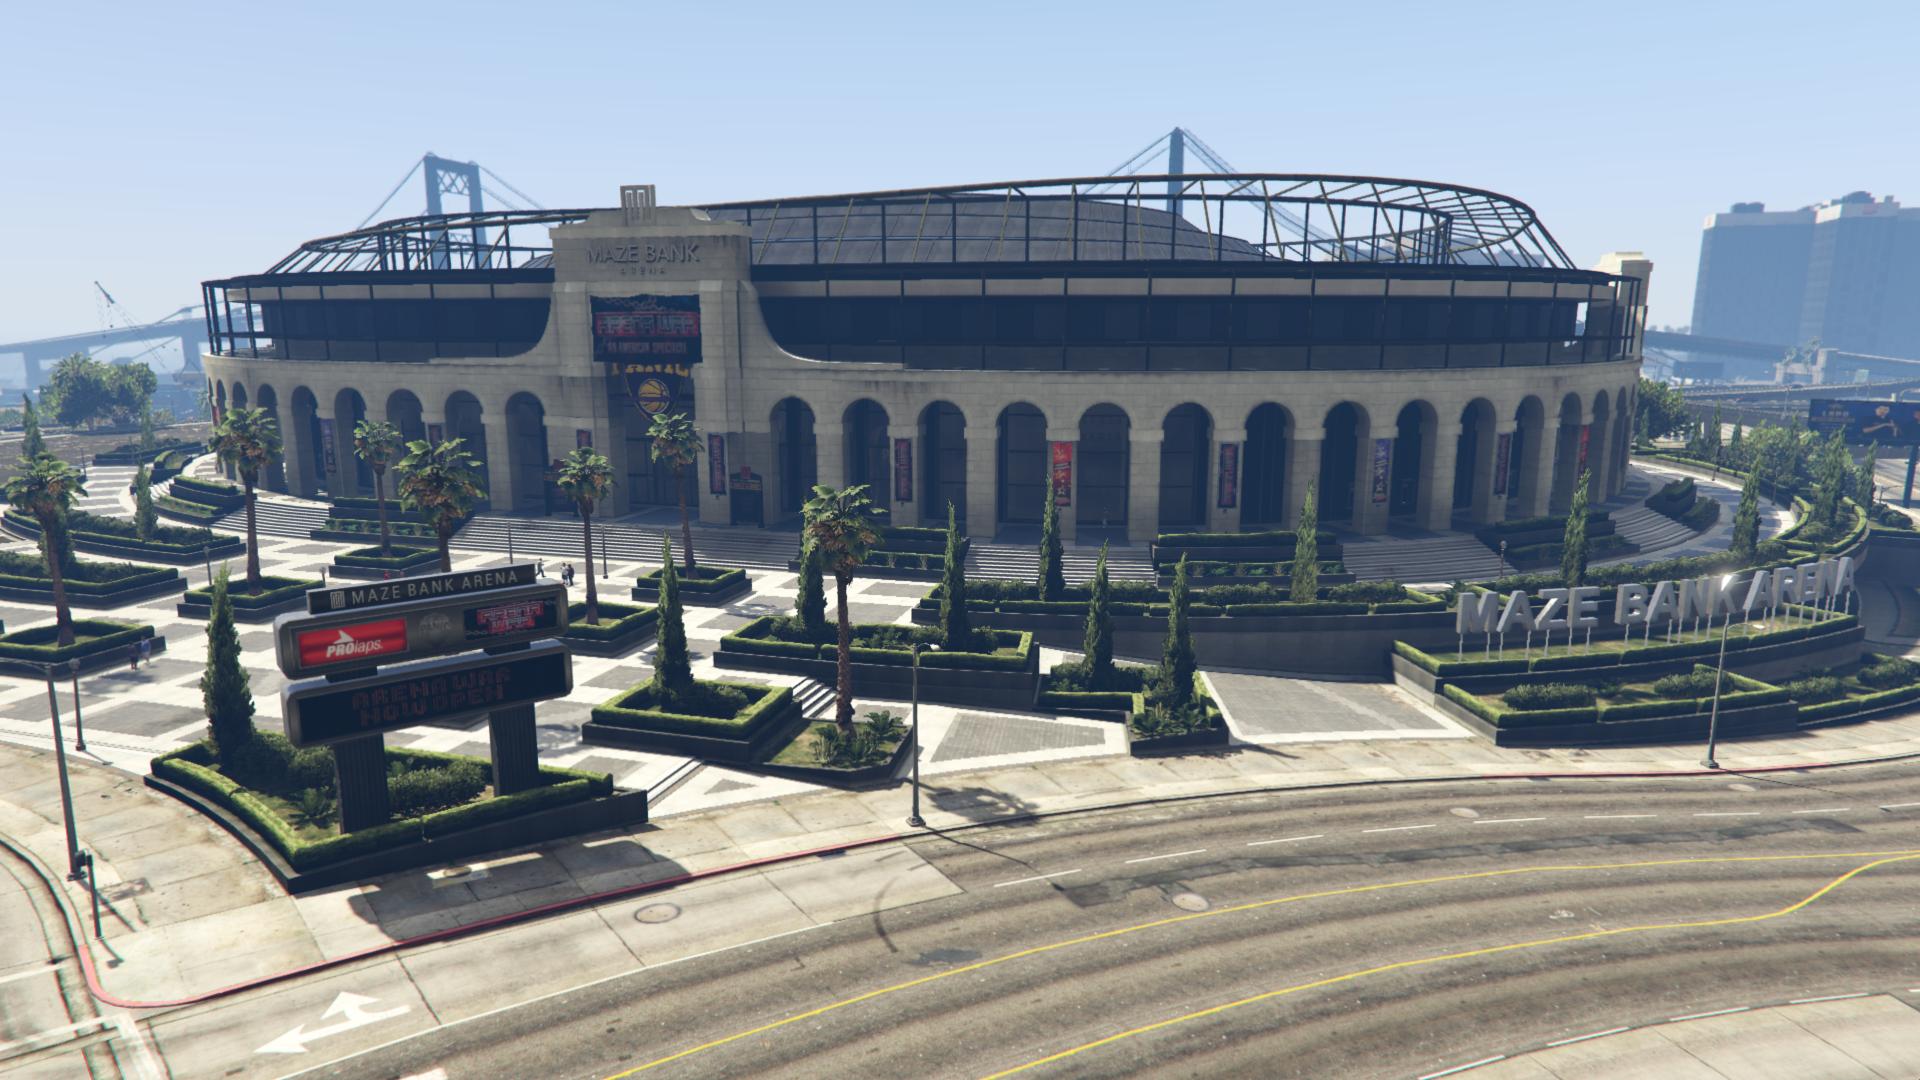 Maze Bank Arena | GTA Wiki | Fandom